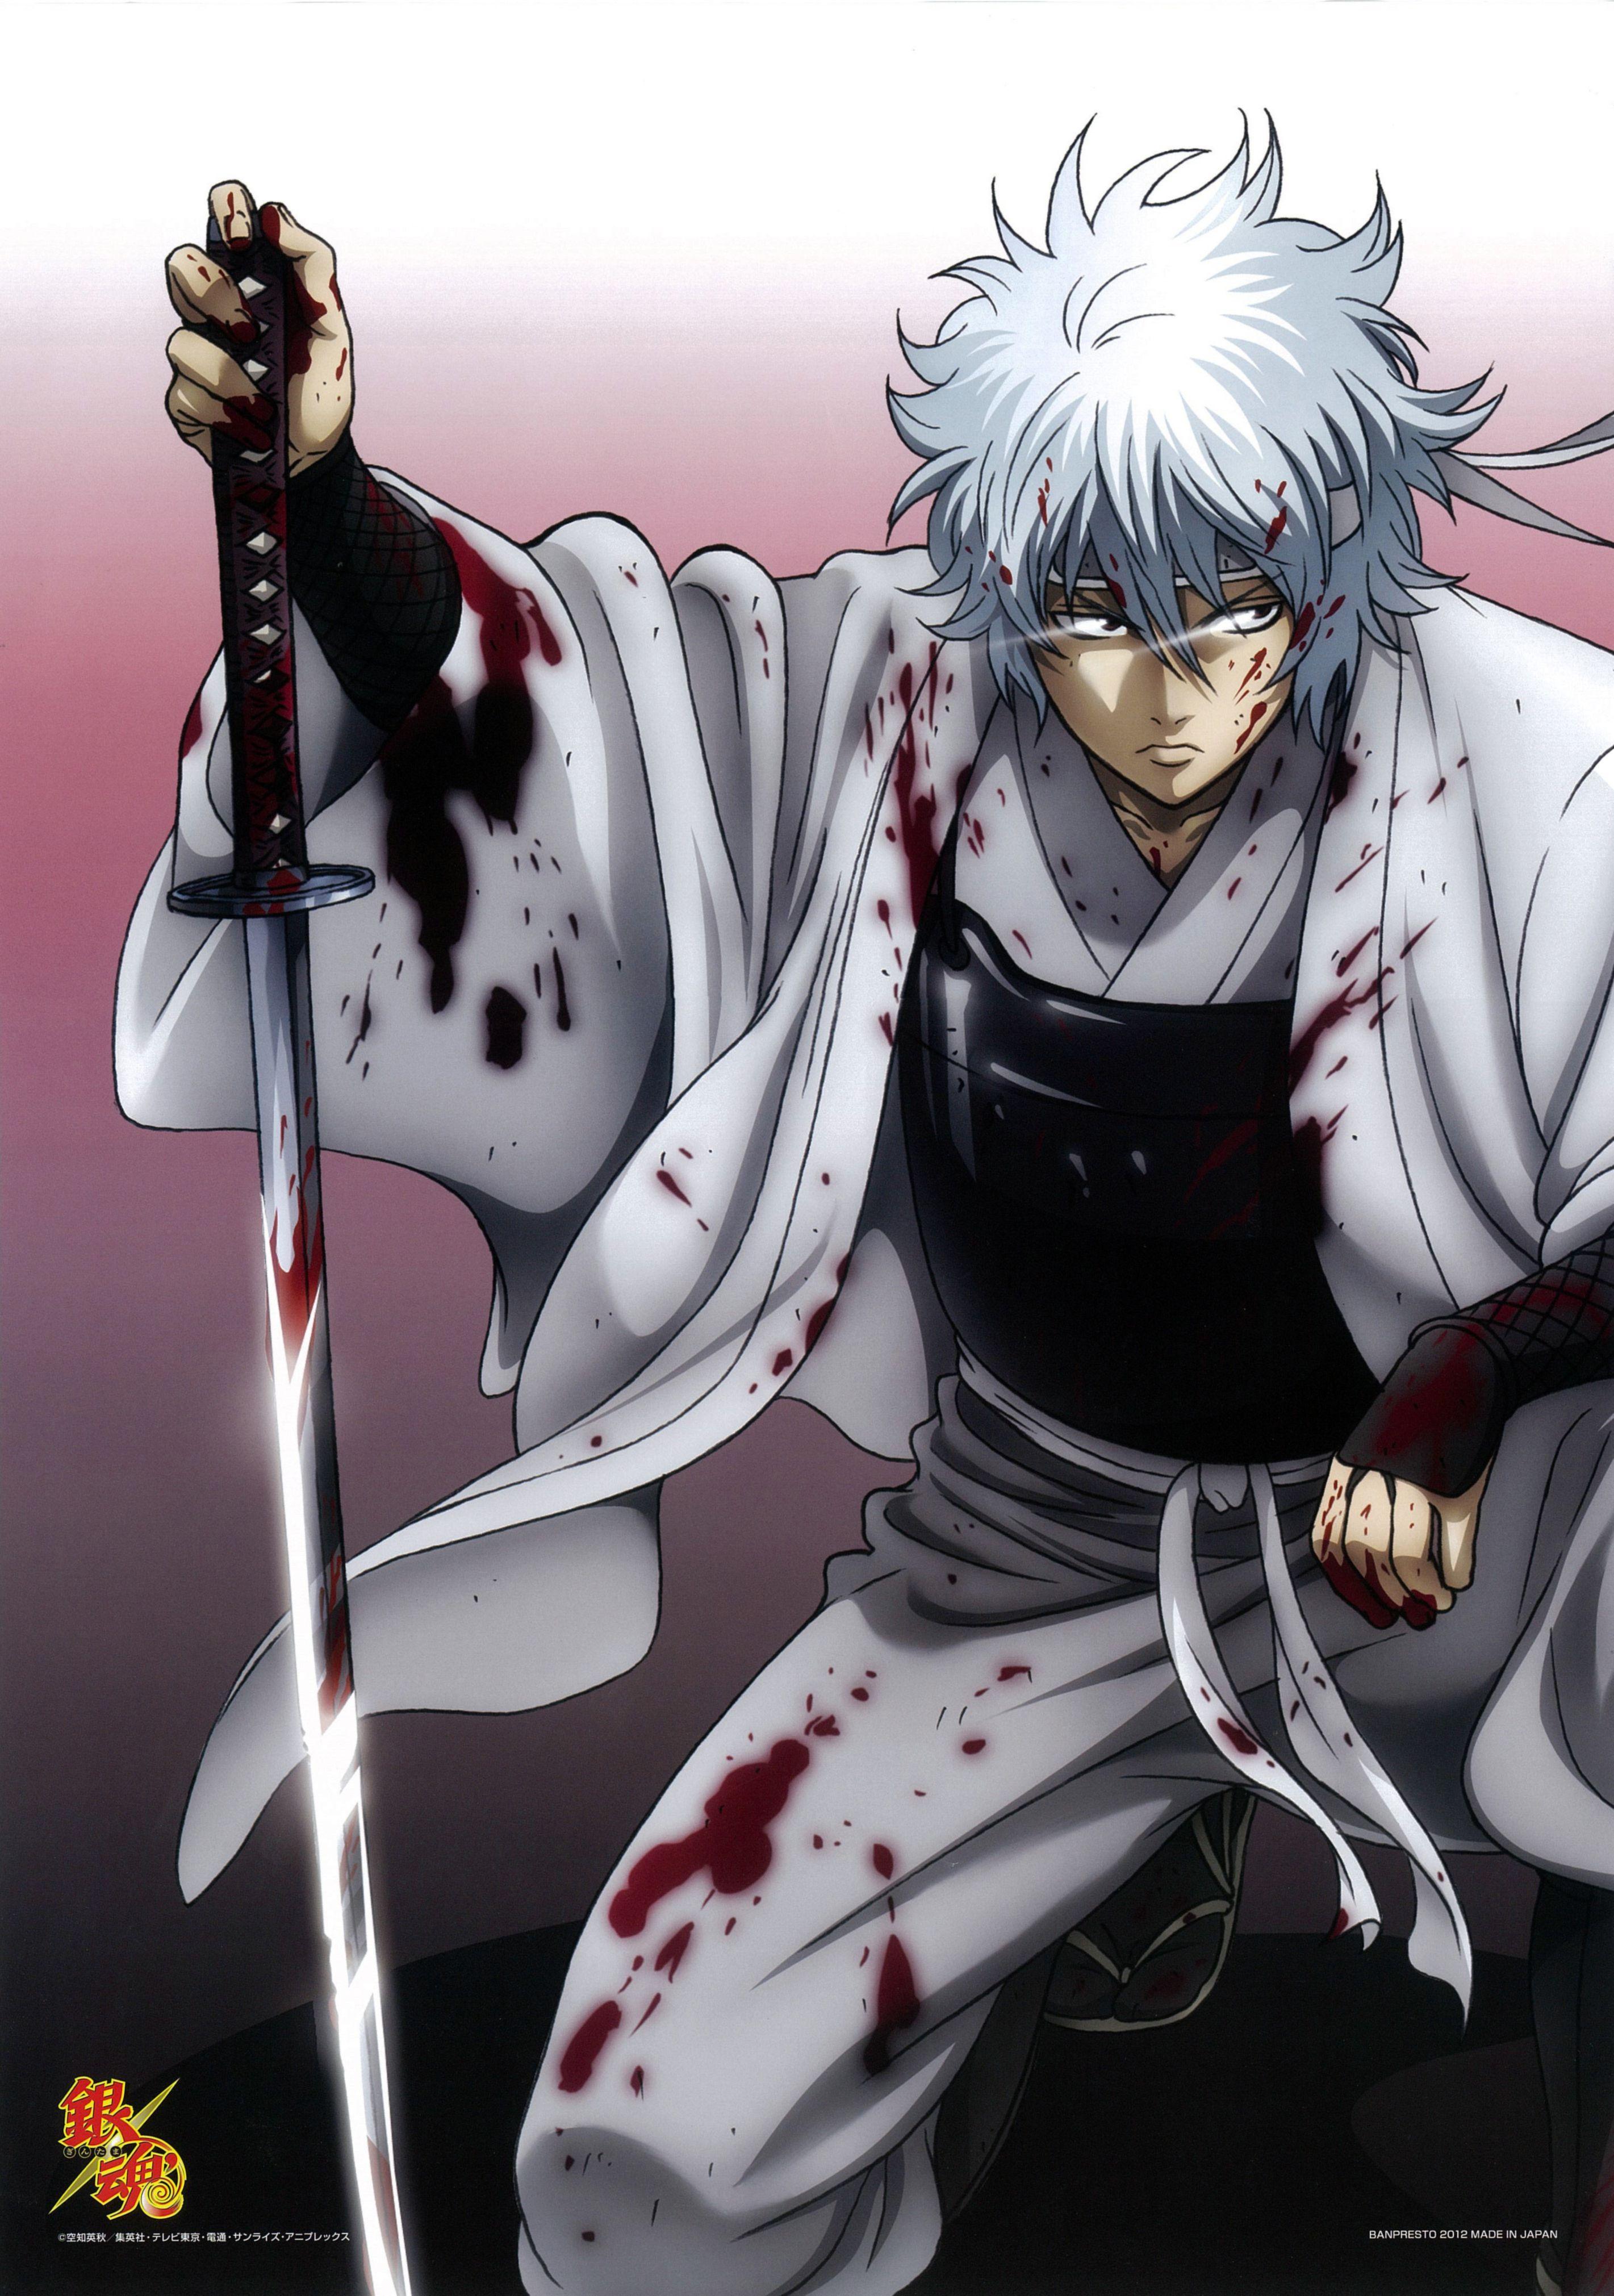 Sakata Gintoki in 2020 Anime, Manga anime, Cute anime